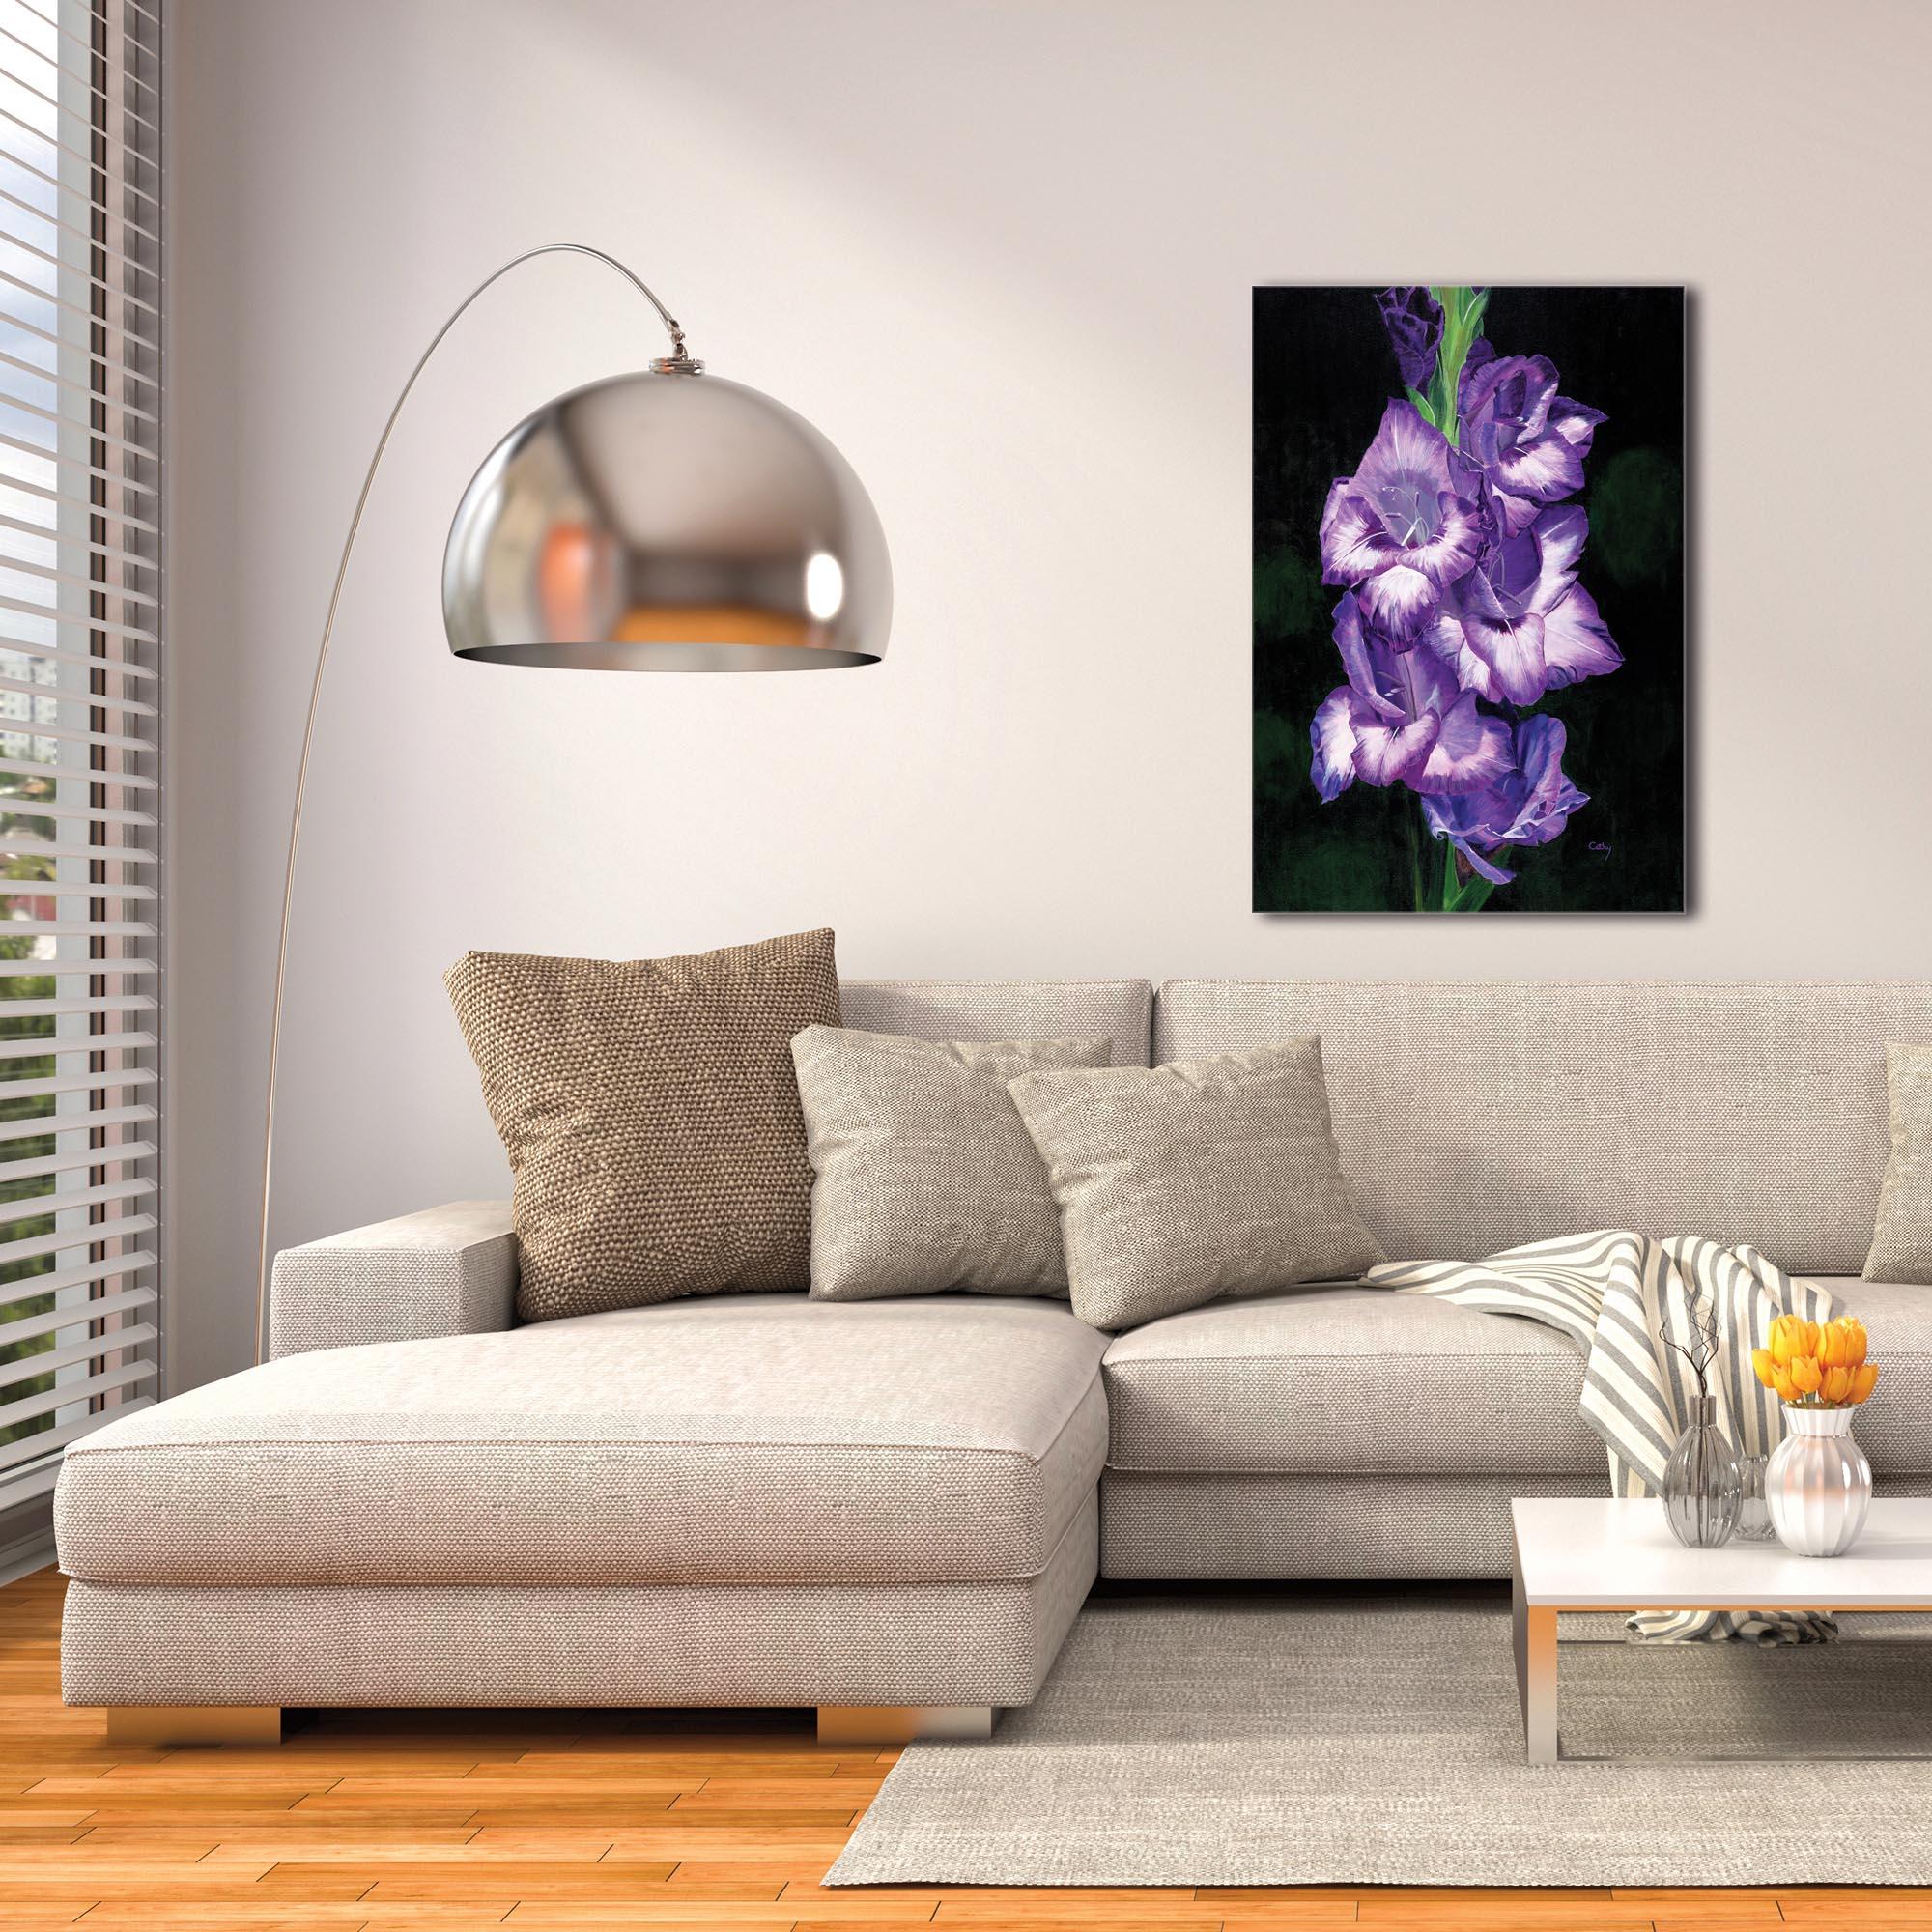 Traditional Wall Art 'Deep Purple Glads' - Floral Decor on Metal or Plexiglass - Image 3